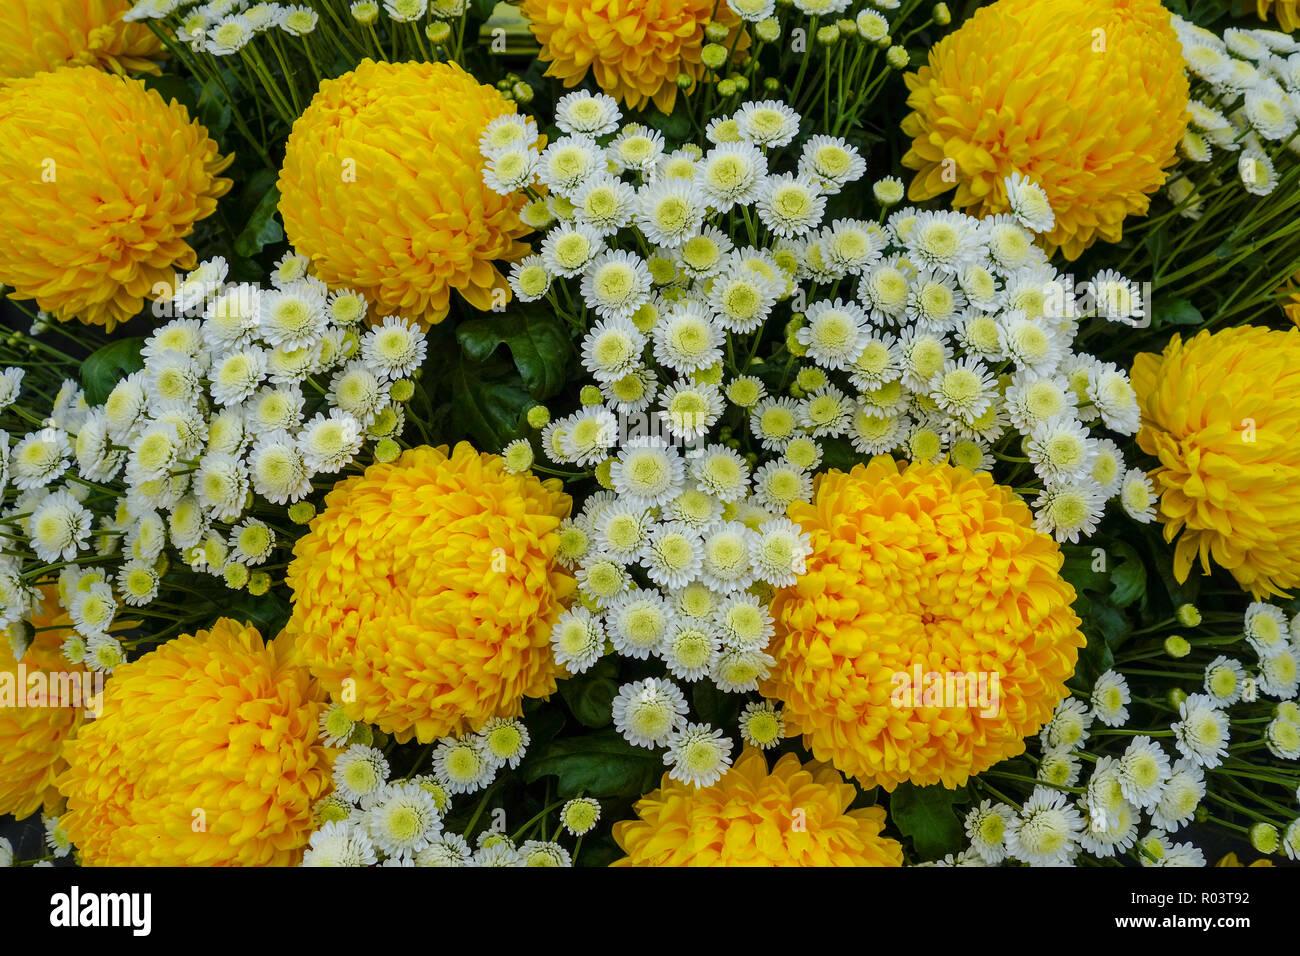 Chrysanthemum 'Misty Golden' and 'Stallion' flowers - Stock Image